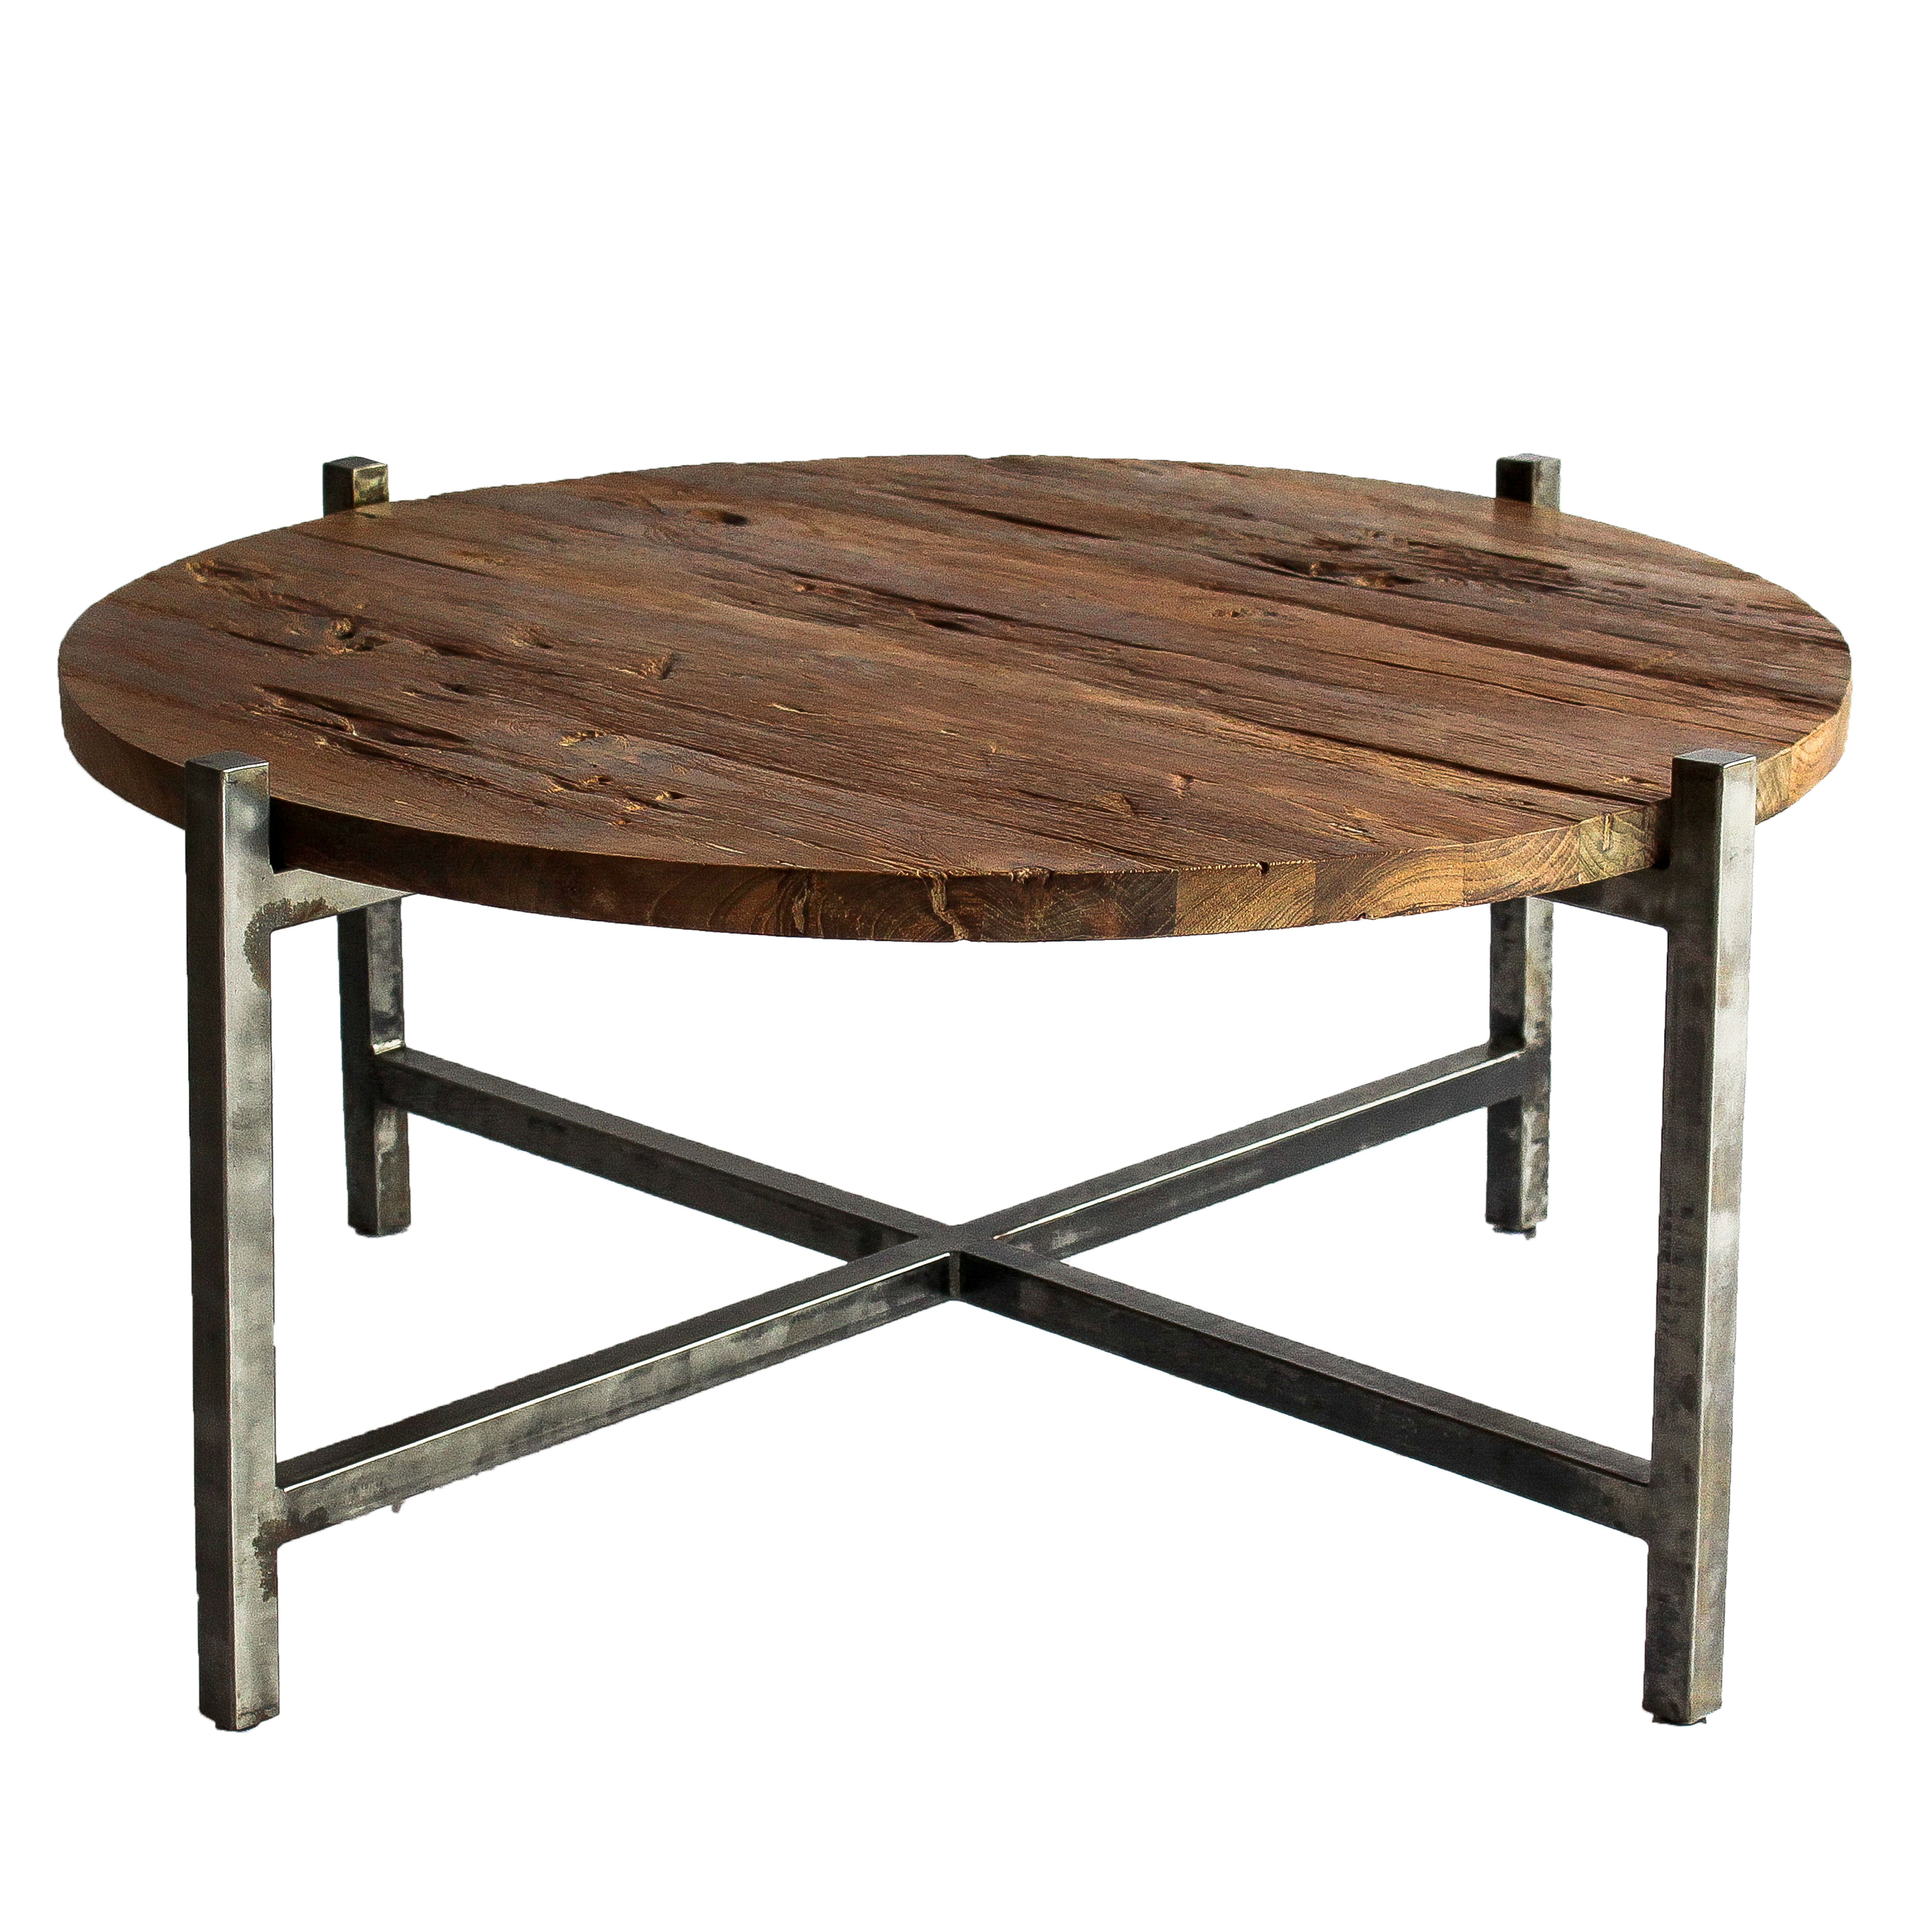 Lotta coffee table gunmetal frame reclaimed teak wood